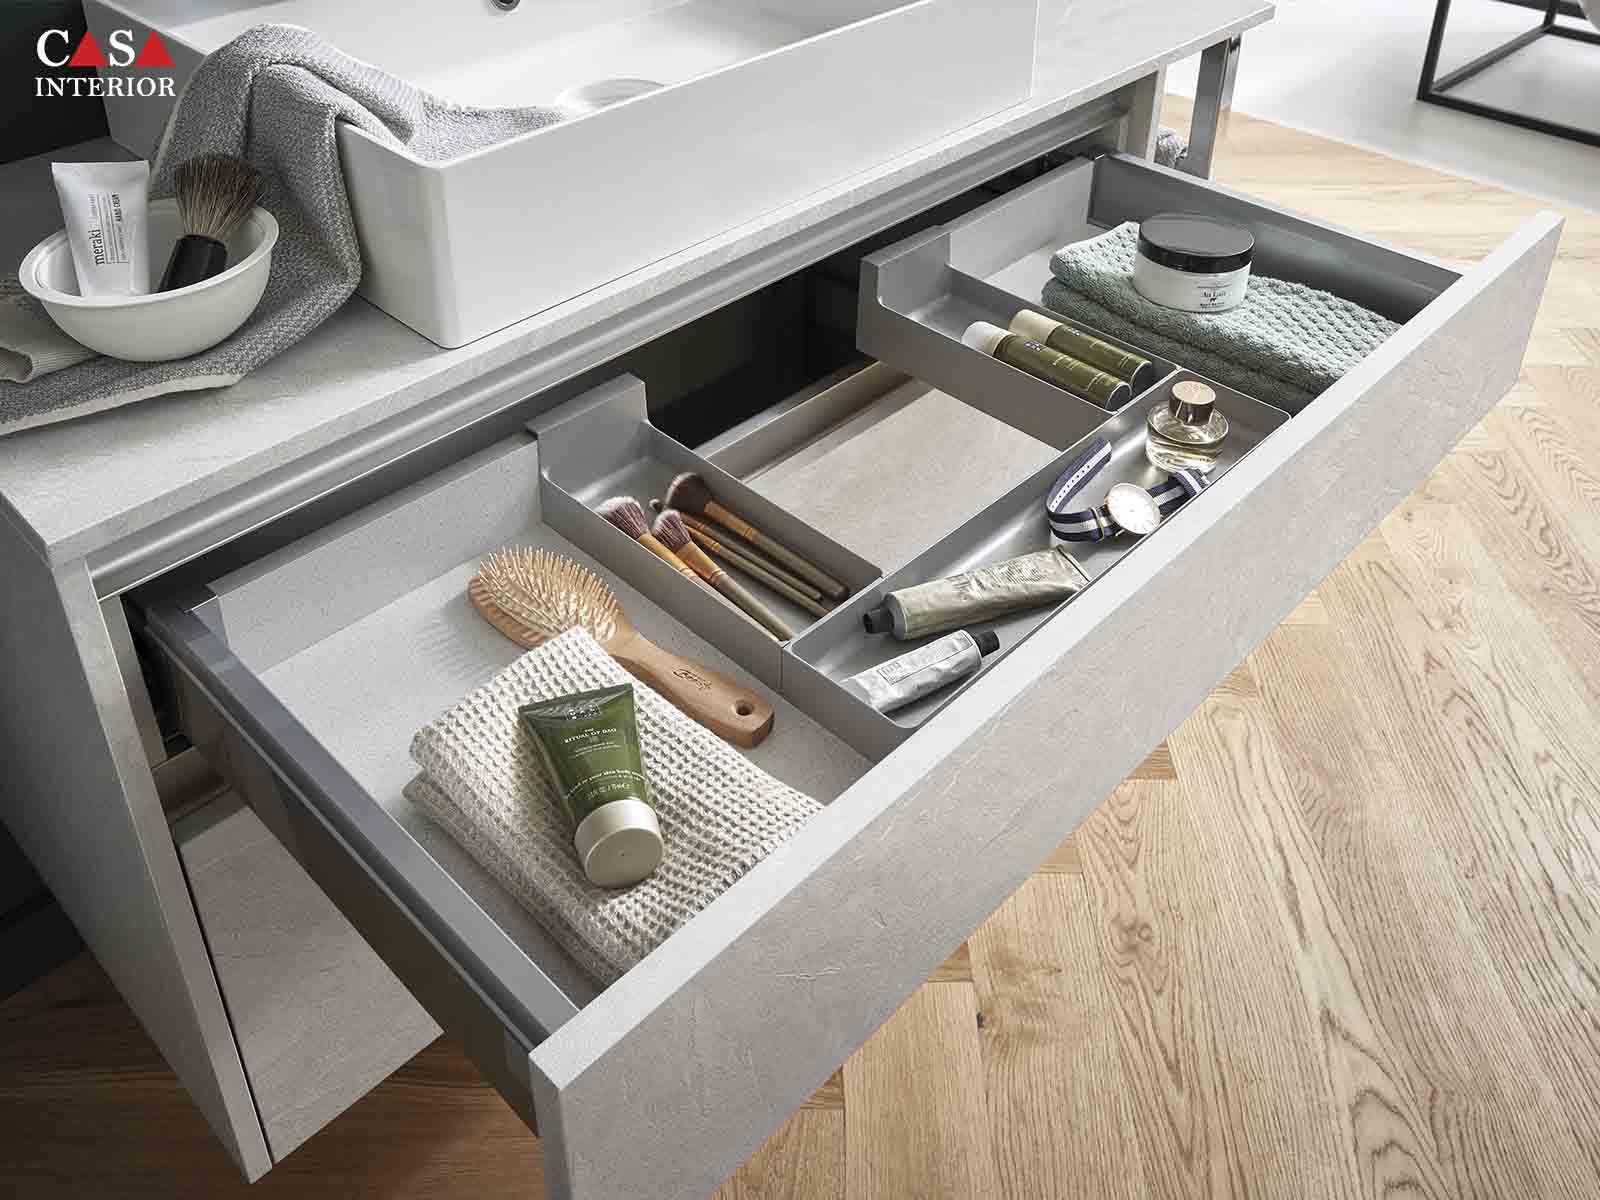 Küchentime StoneArt Stone grey slate reproduction 304 - Bathroom